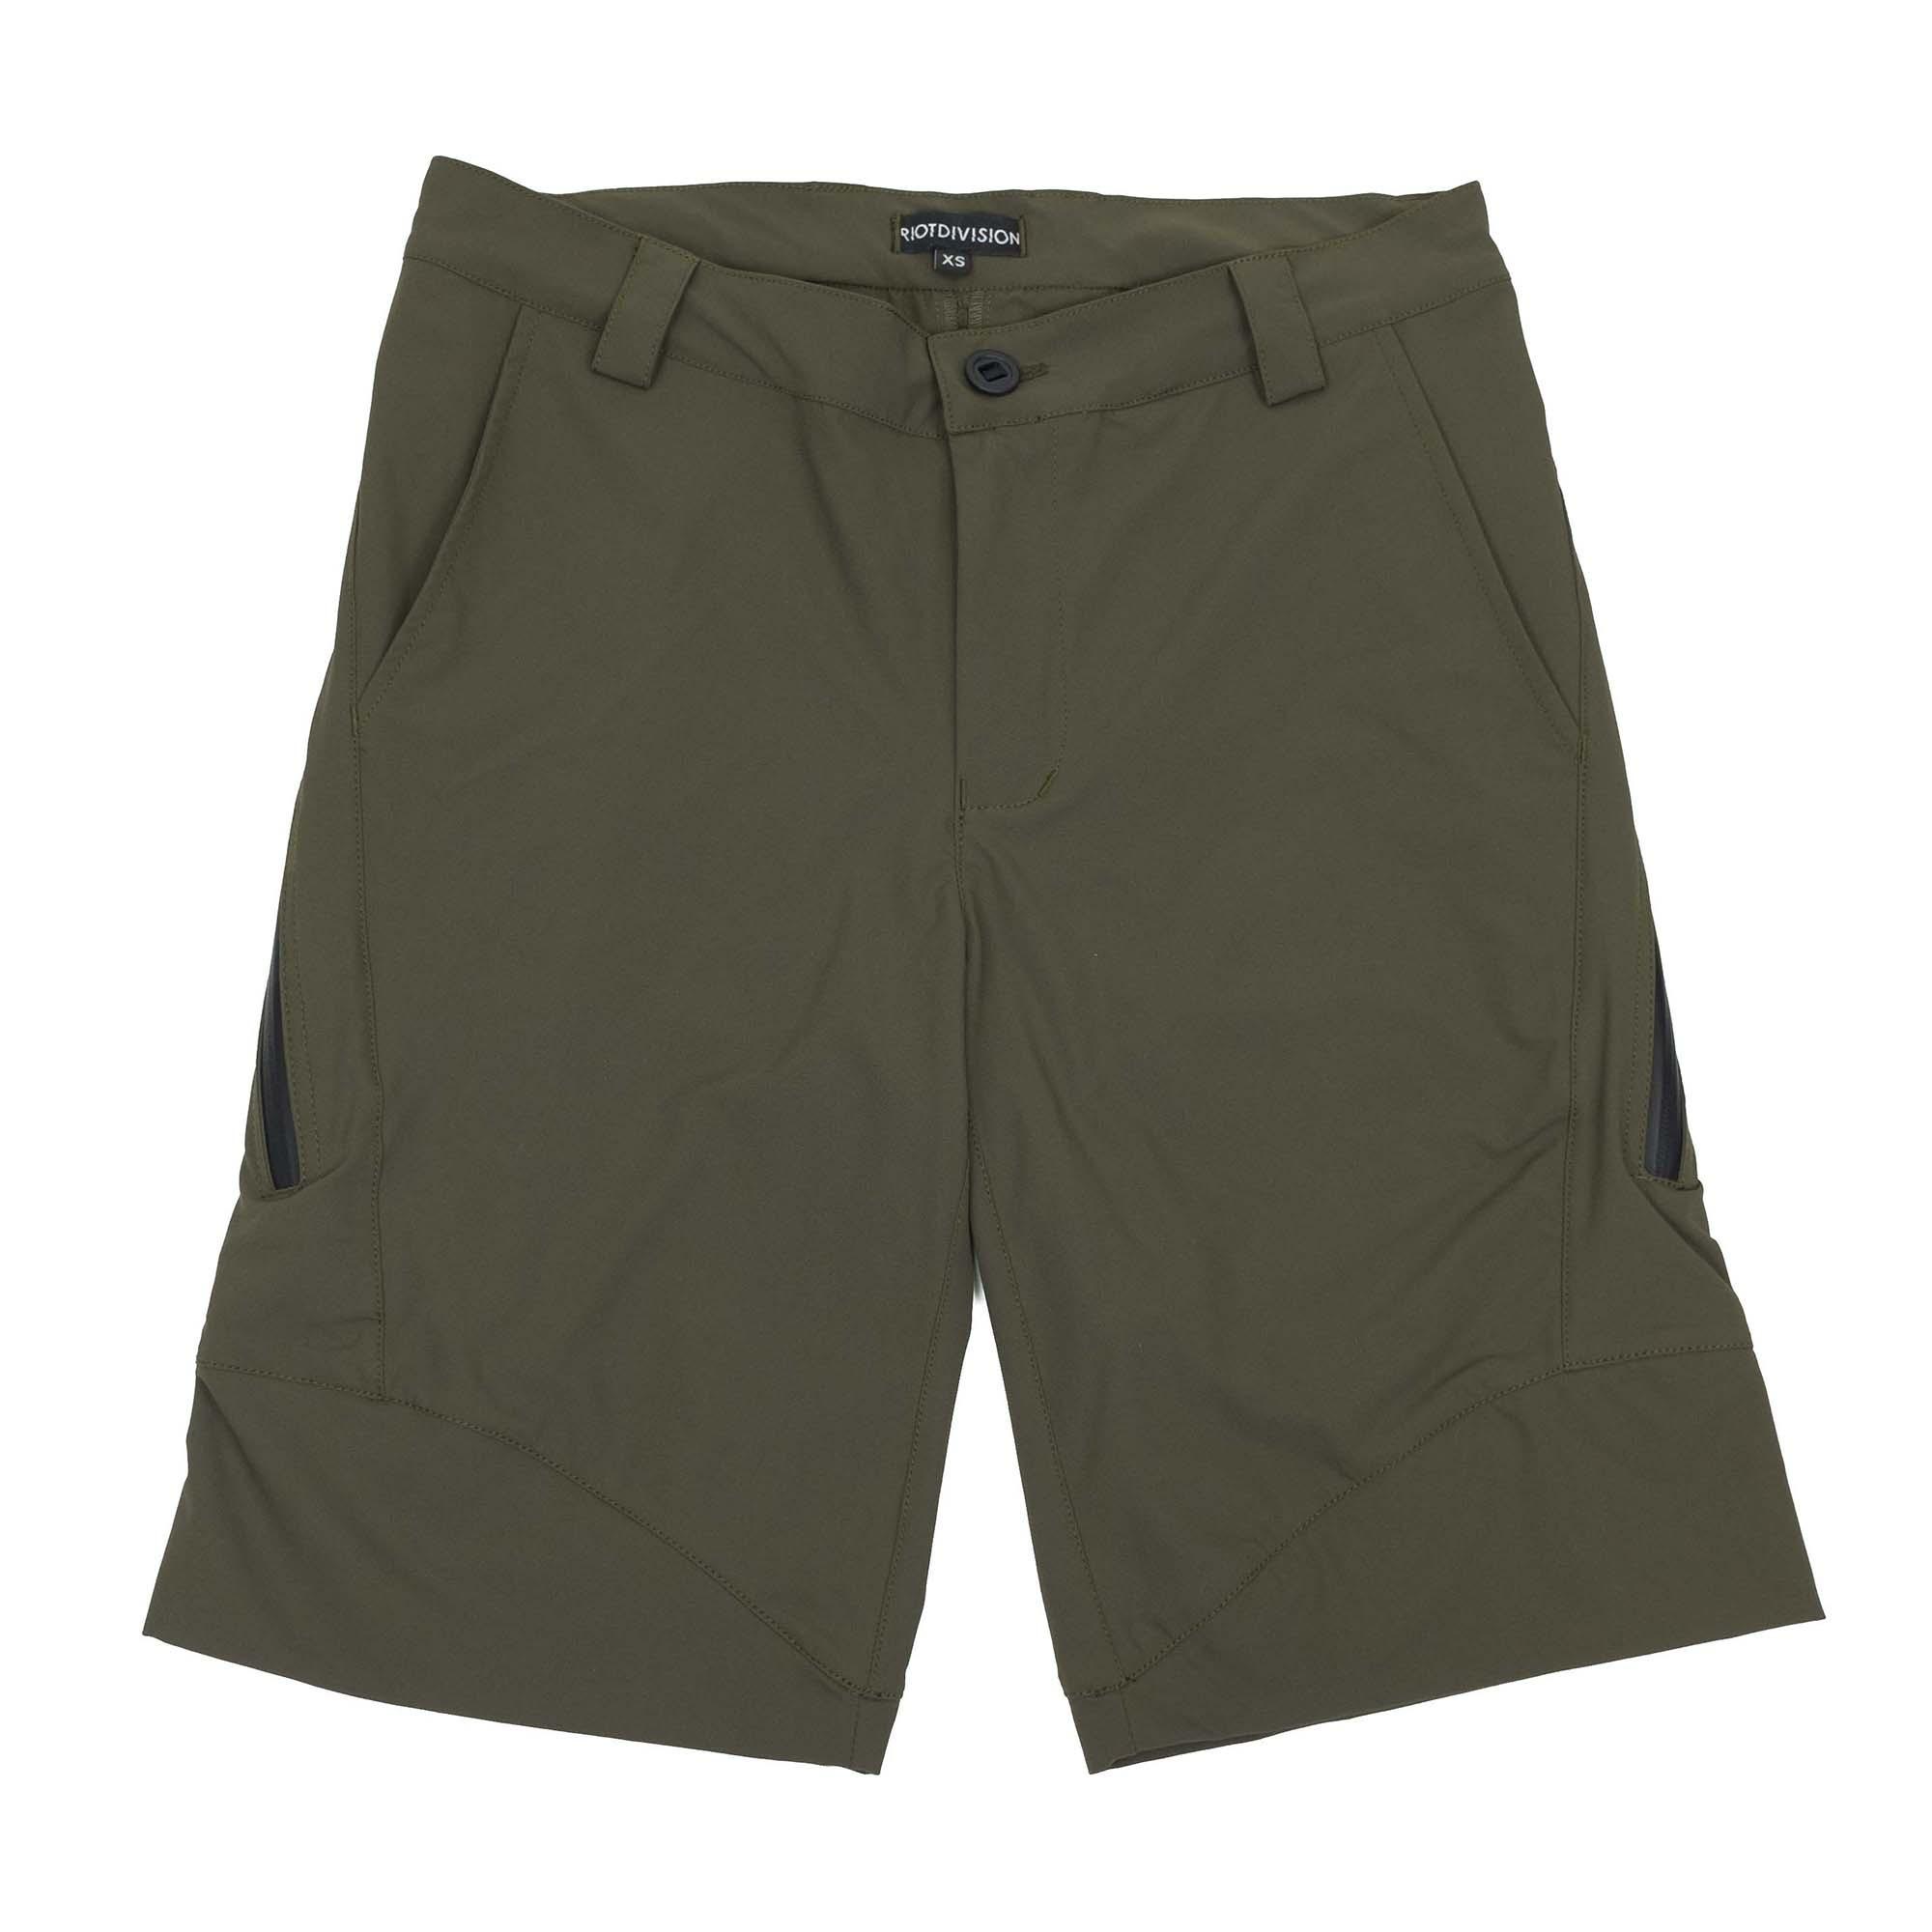 Riot Division Concealed Shorts - Khaki